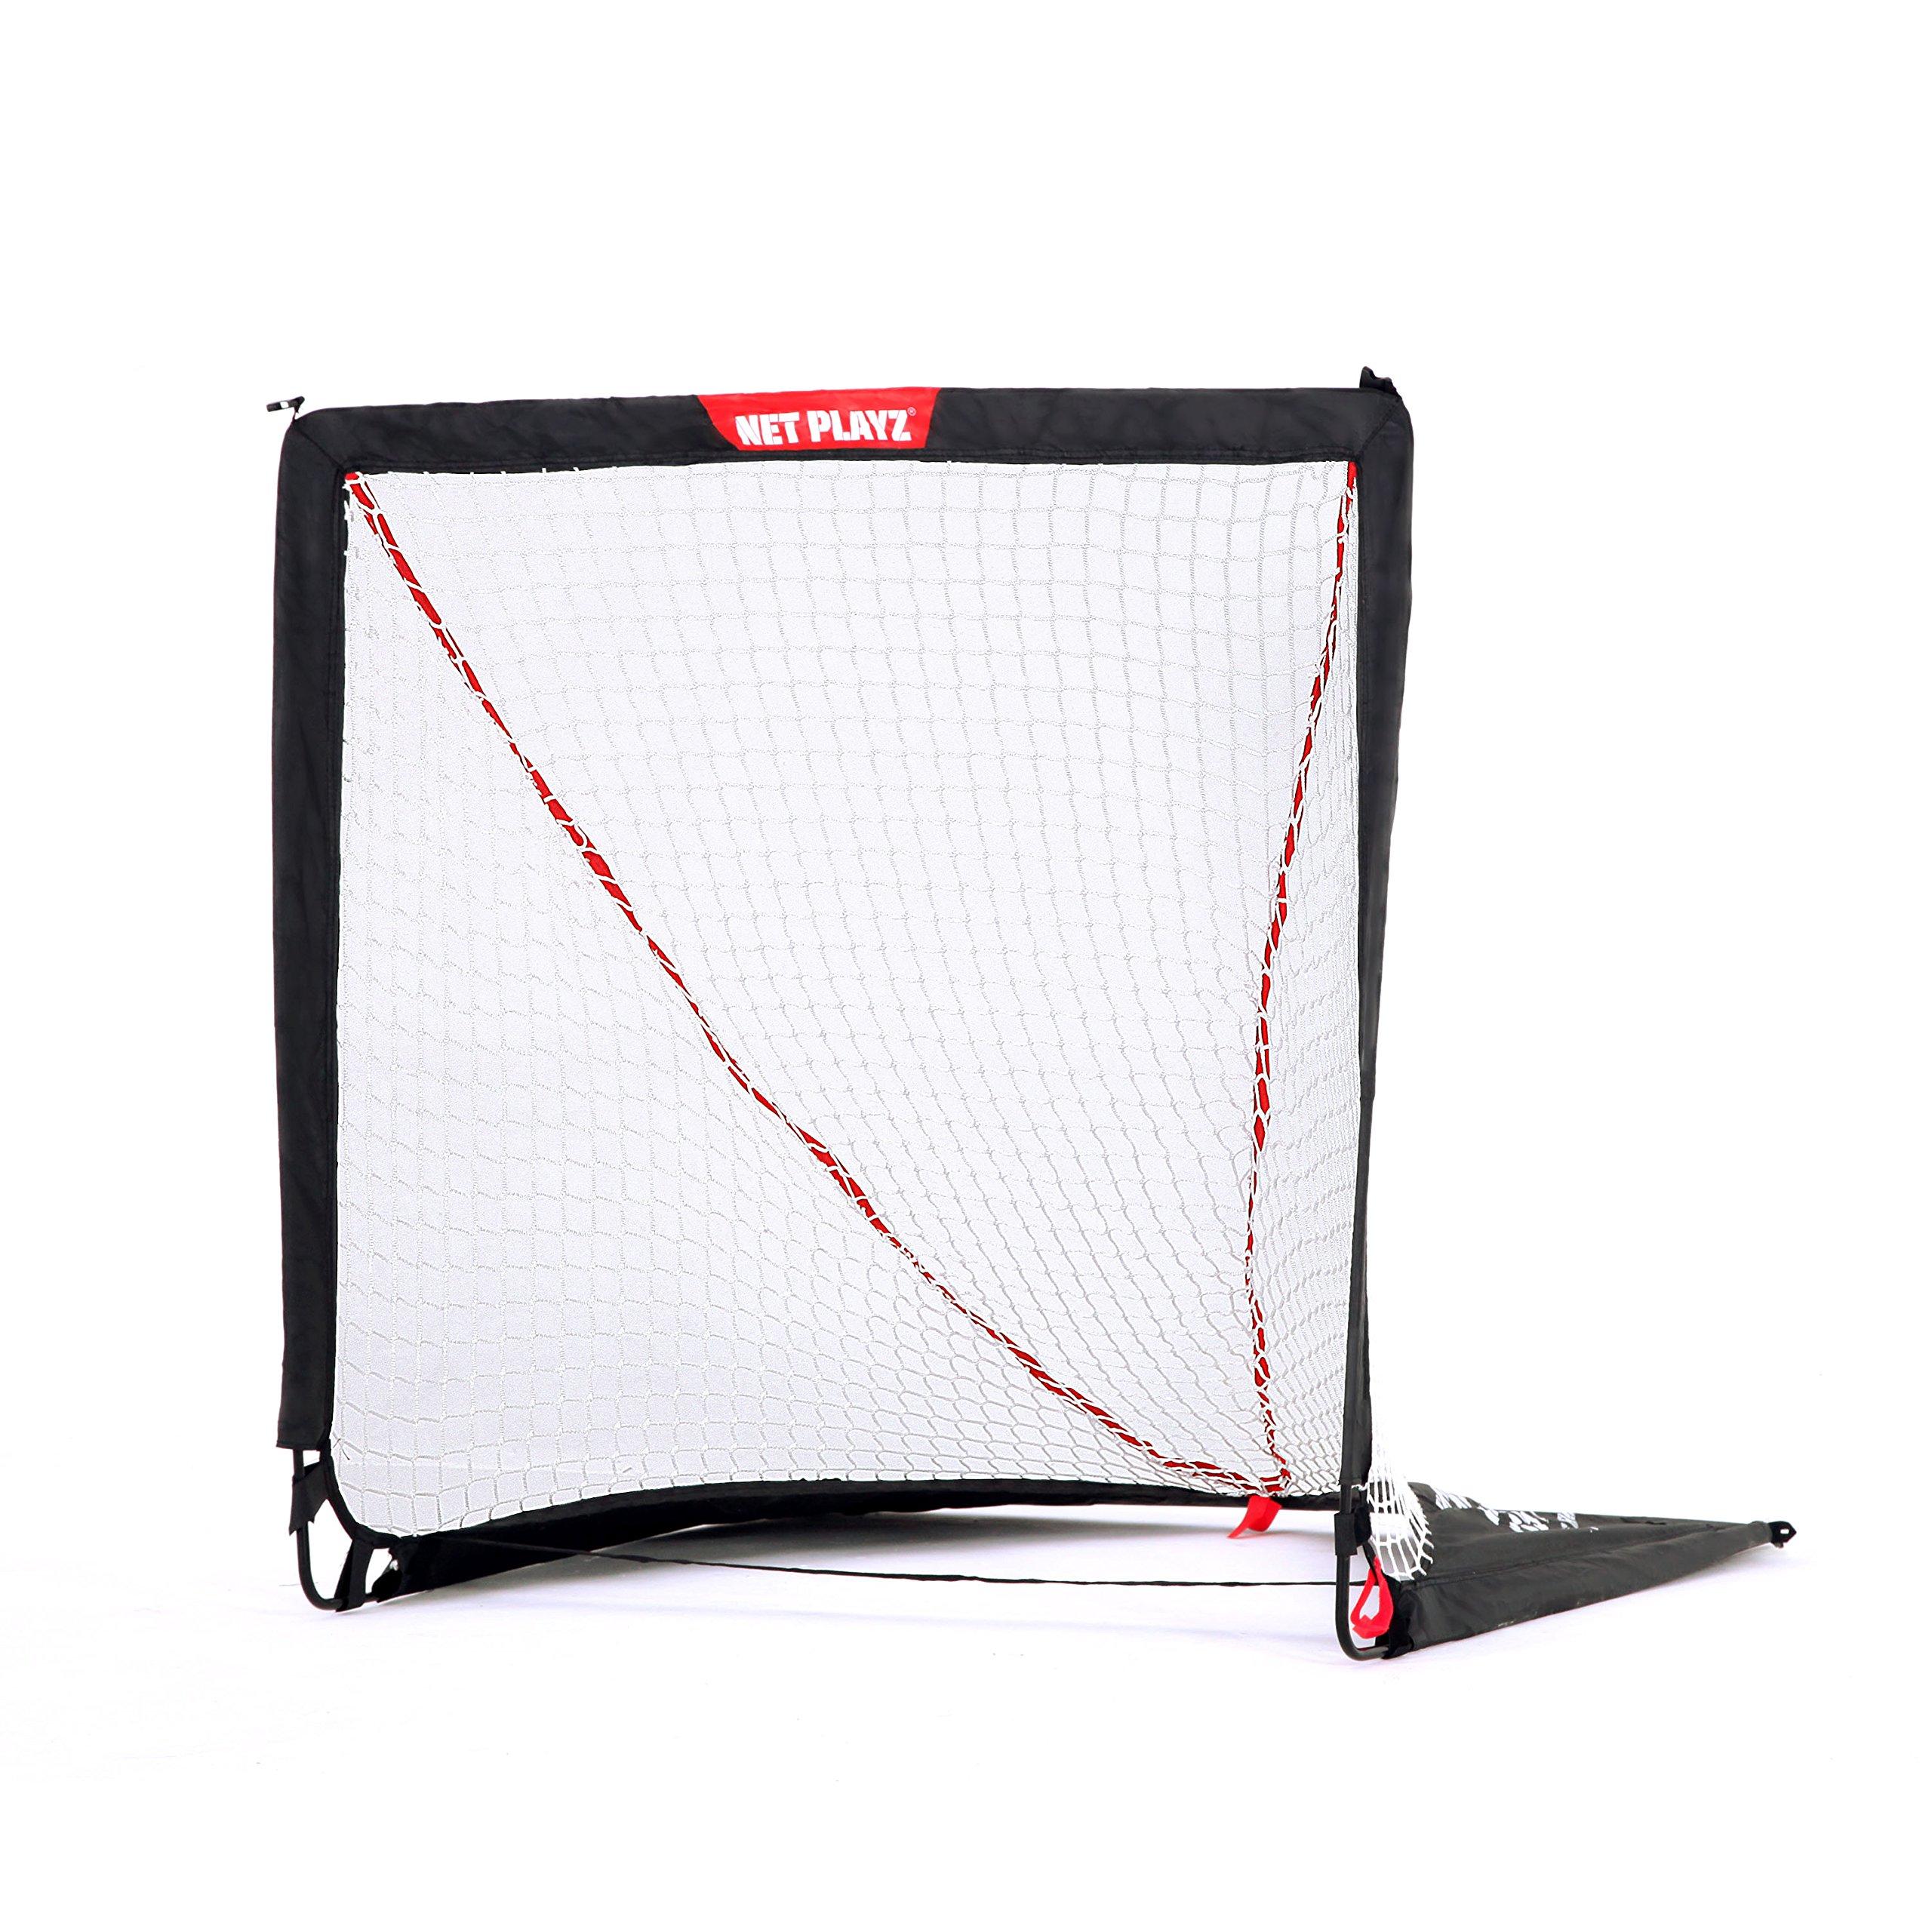 NET PLAYZ 4 x 4 x 4 Feet Lacrosse Goal Fast Install, Fiberglass Frme, Lightweight, Foldable, Portable, Carry bag Included by NET PLAYZ (Image #1)